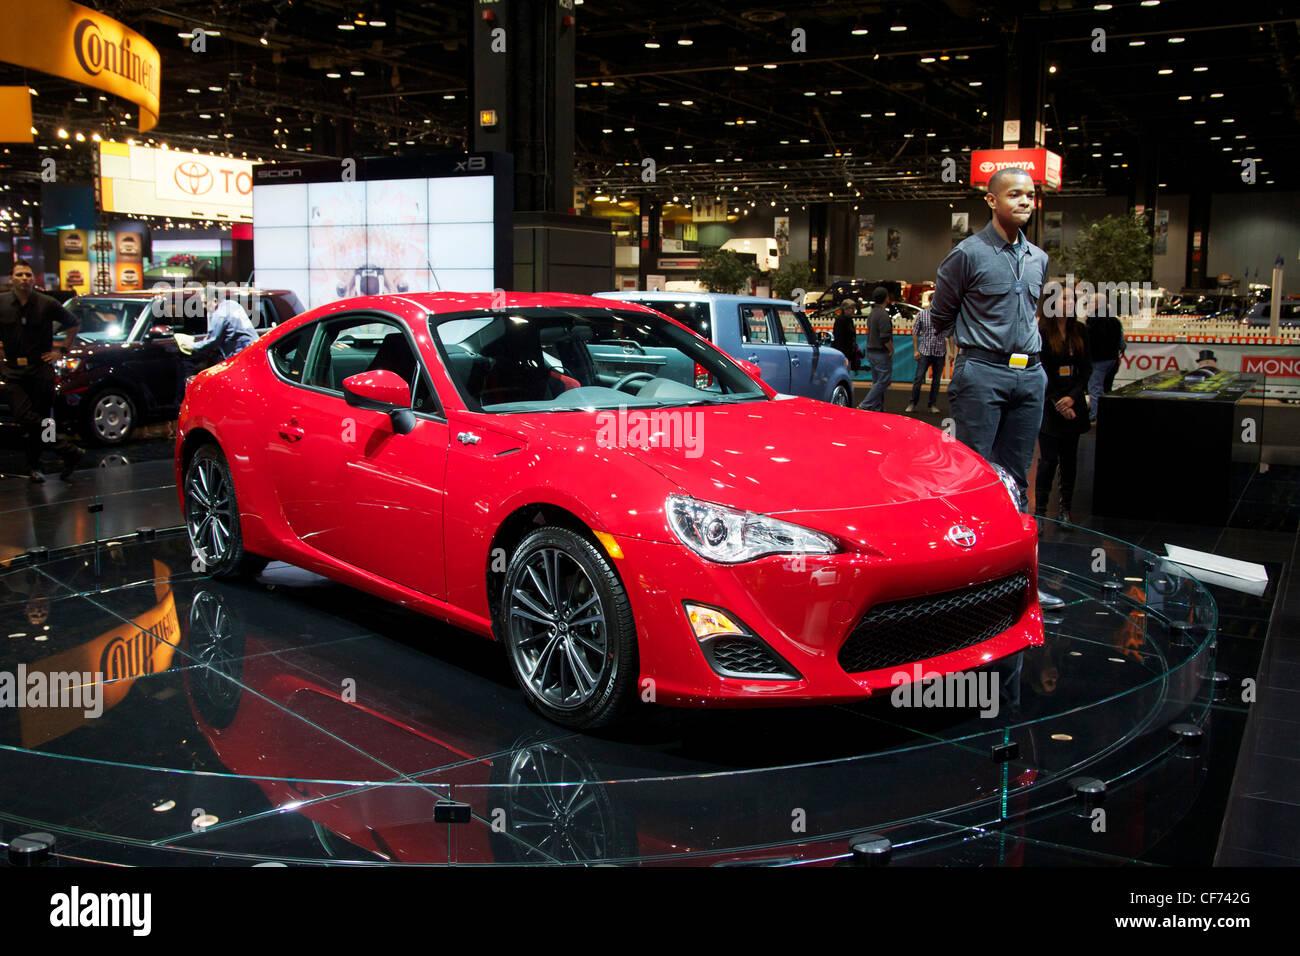 2013 Scion FR-S. 2012 Chicago Auto Show. - Stock Image